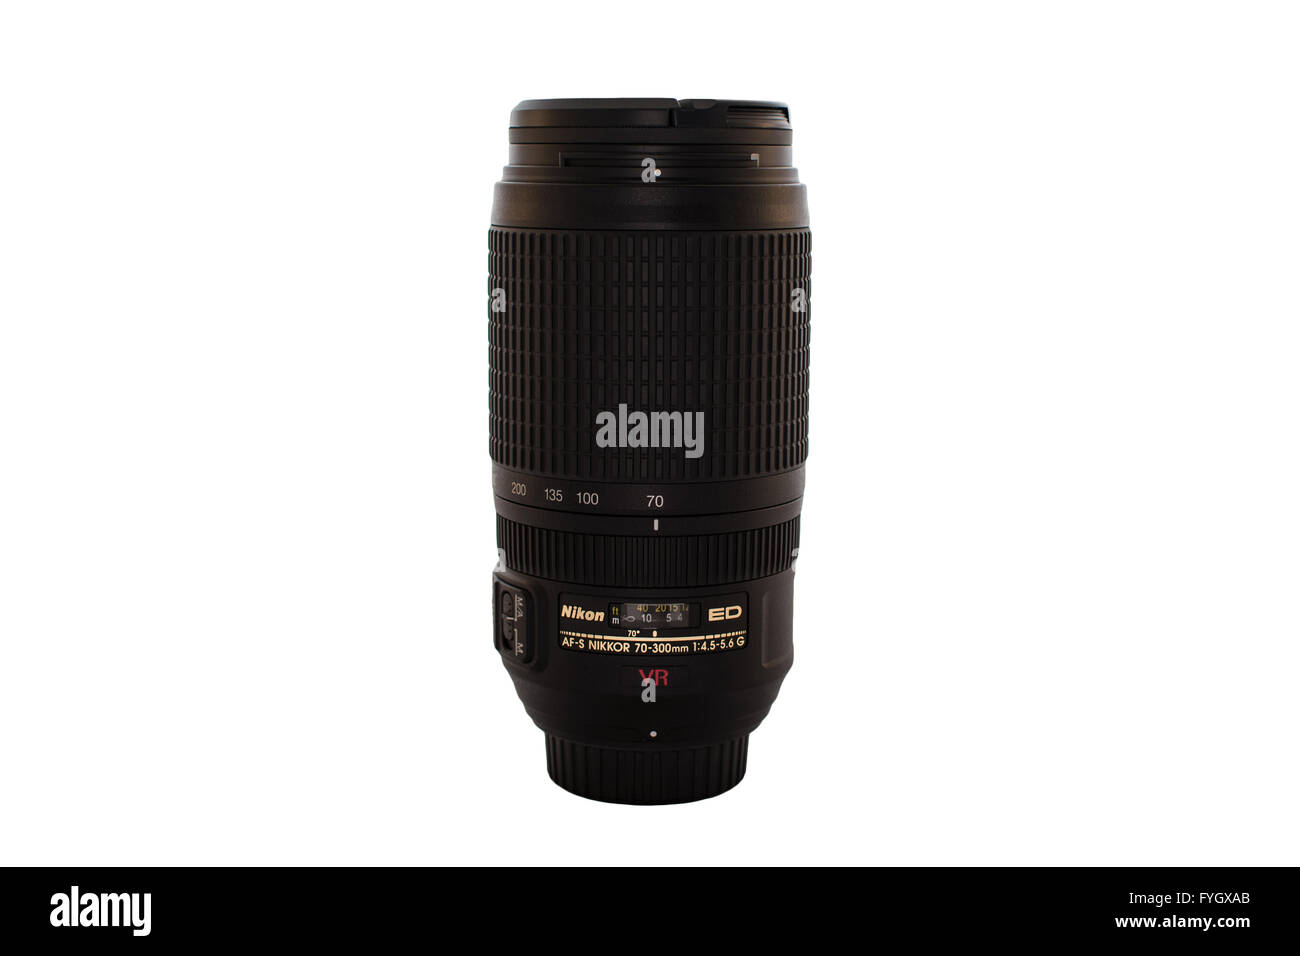 A Nikon Lens' - Stock Image